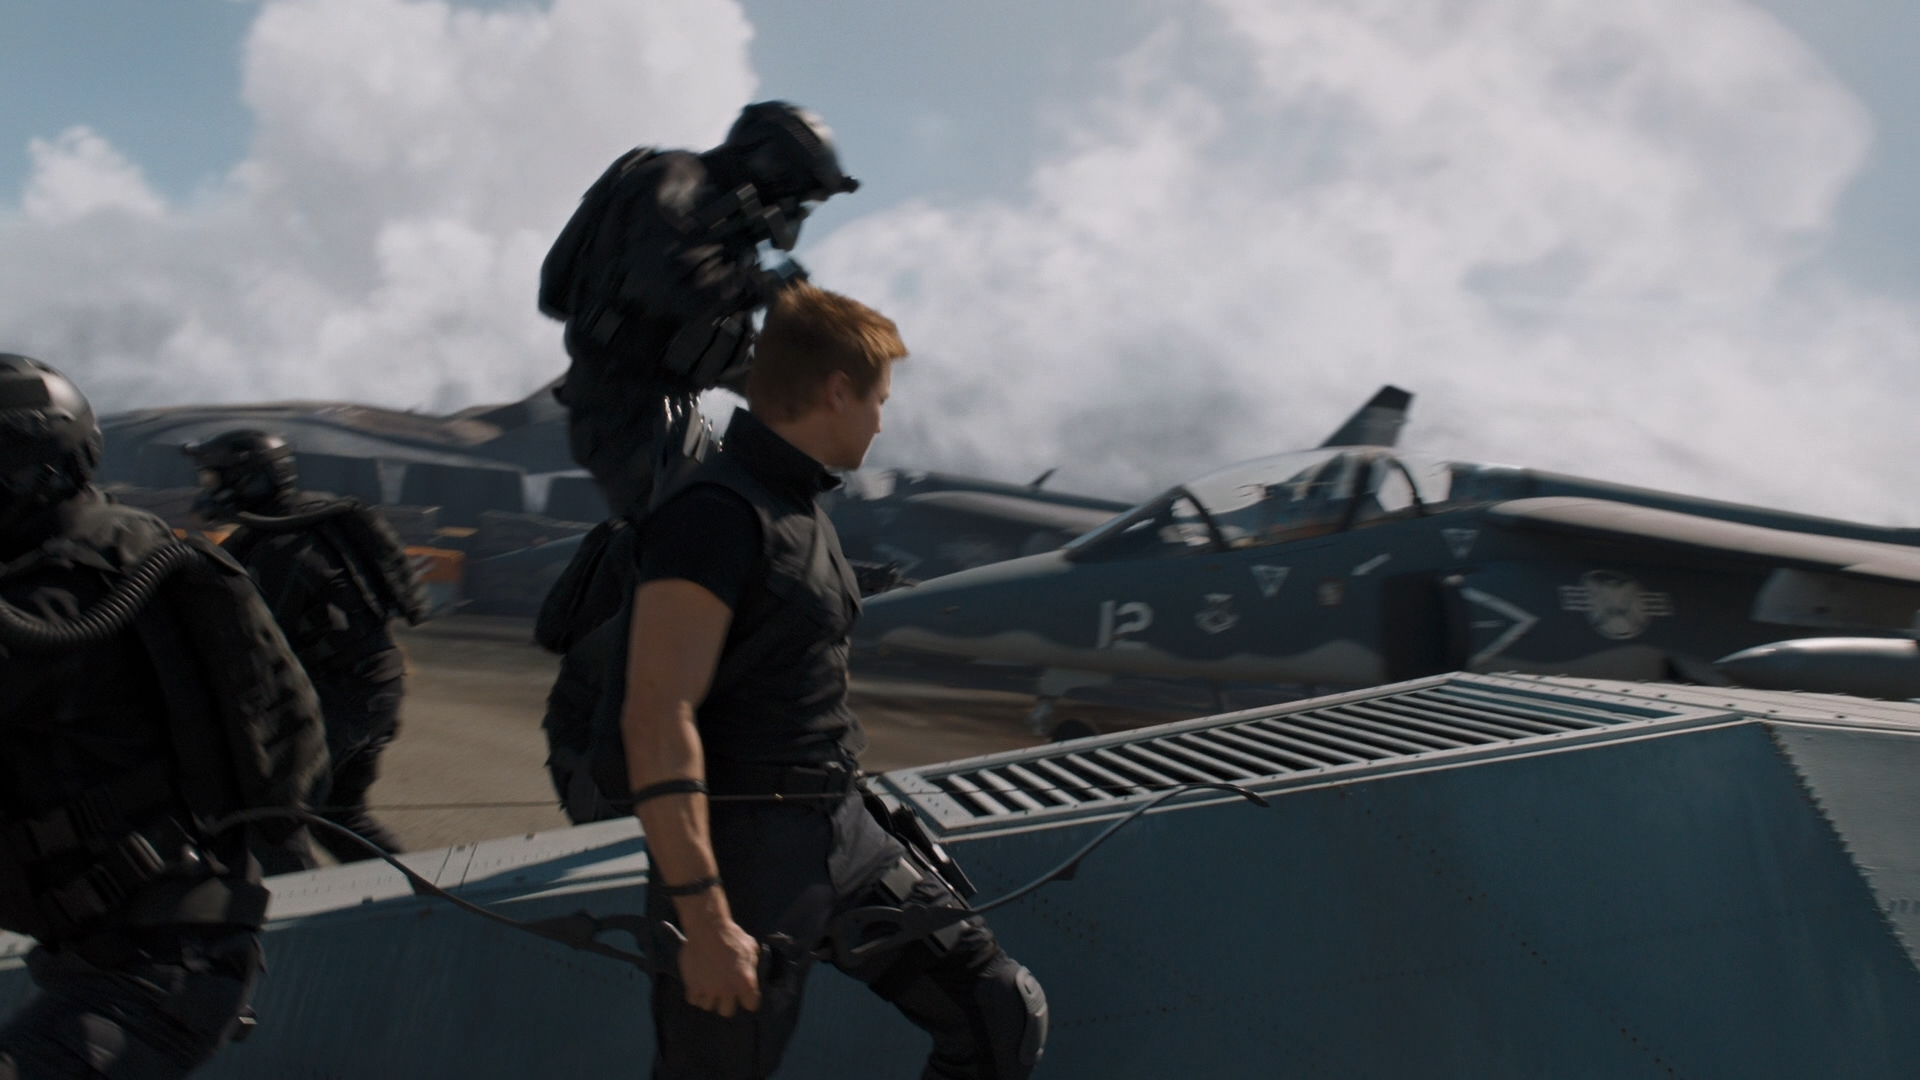 THE AVENGERS (2012) - Hawkeye's (Jeremy Renner) H&K P30 Stunt Pistol - Image 10 of 10